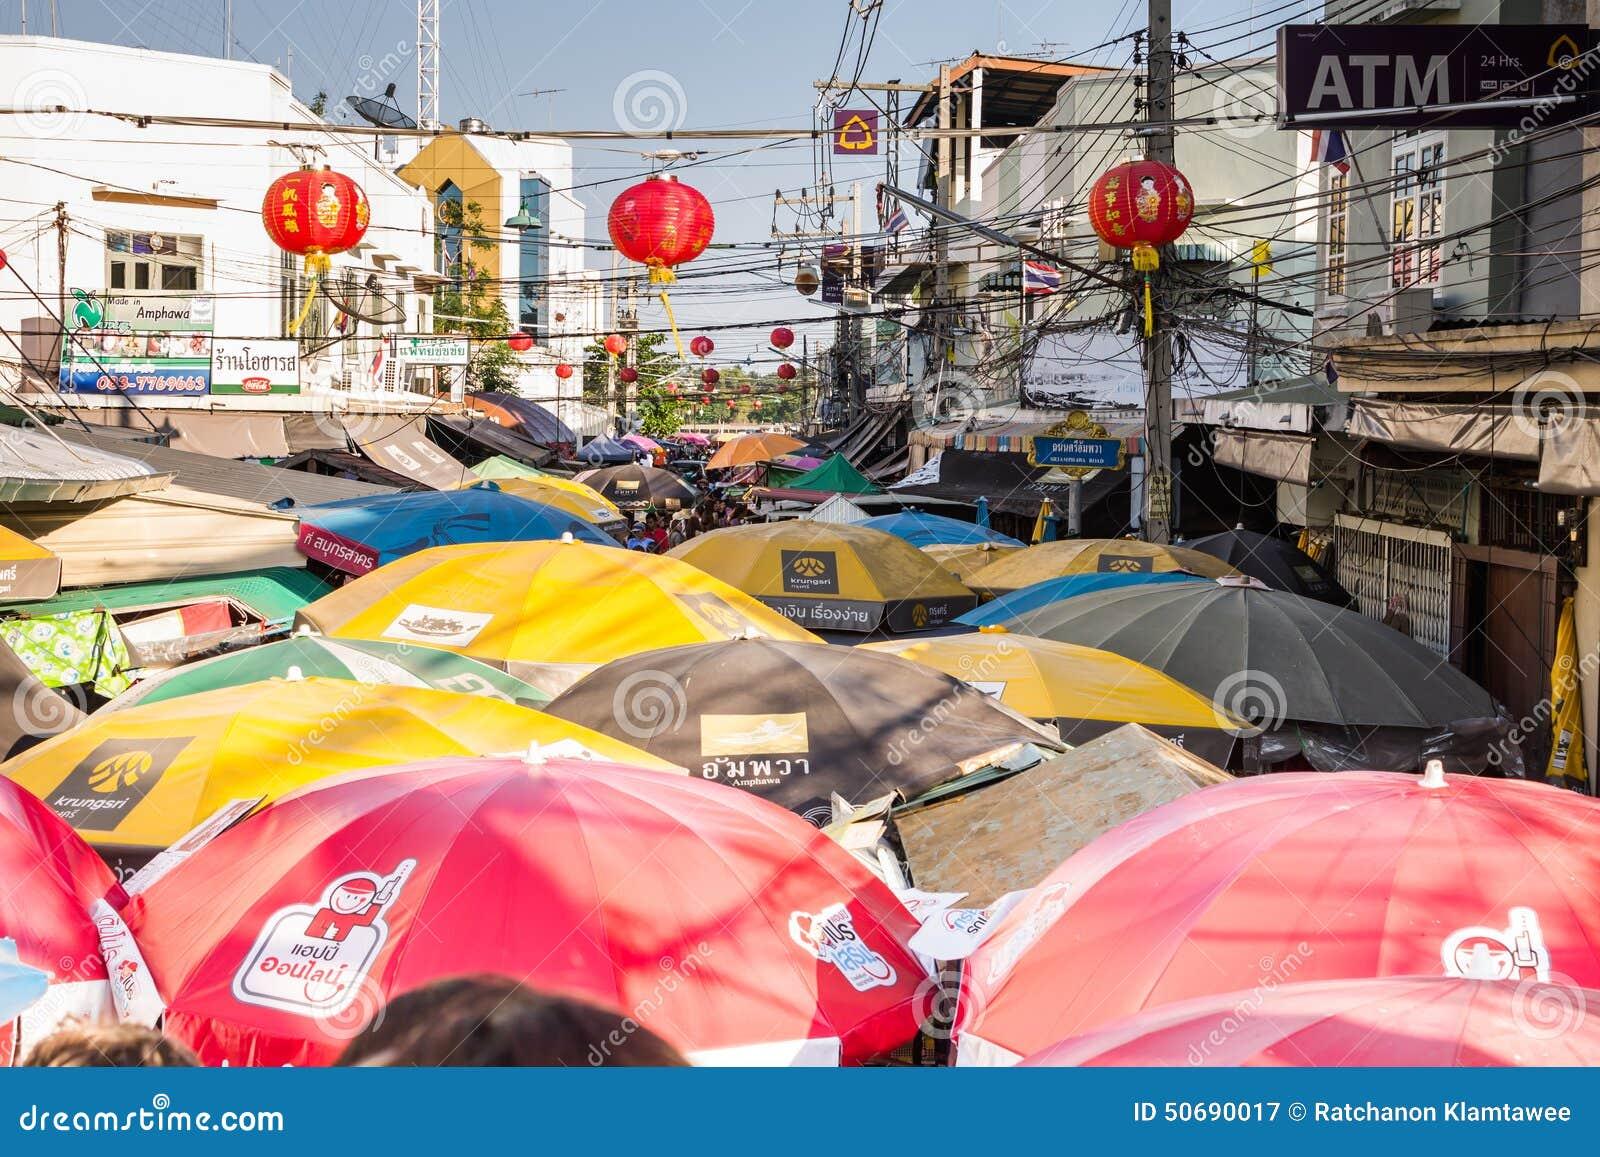 Download 浮动的市场 图库摄影片. 图片 包括有 小船, beatles, 小丑, 的treadled, 贸易, 红色 - 50690017